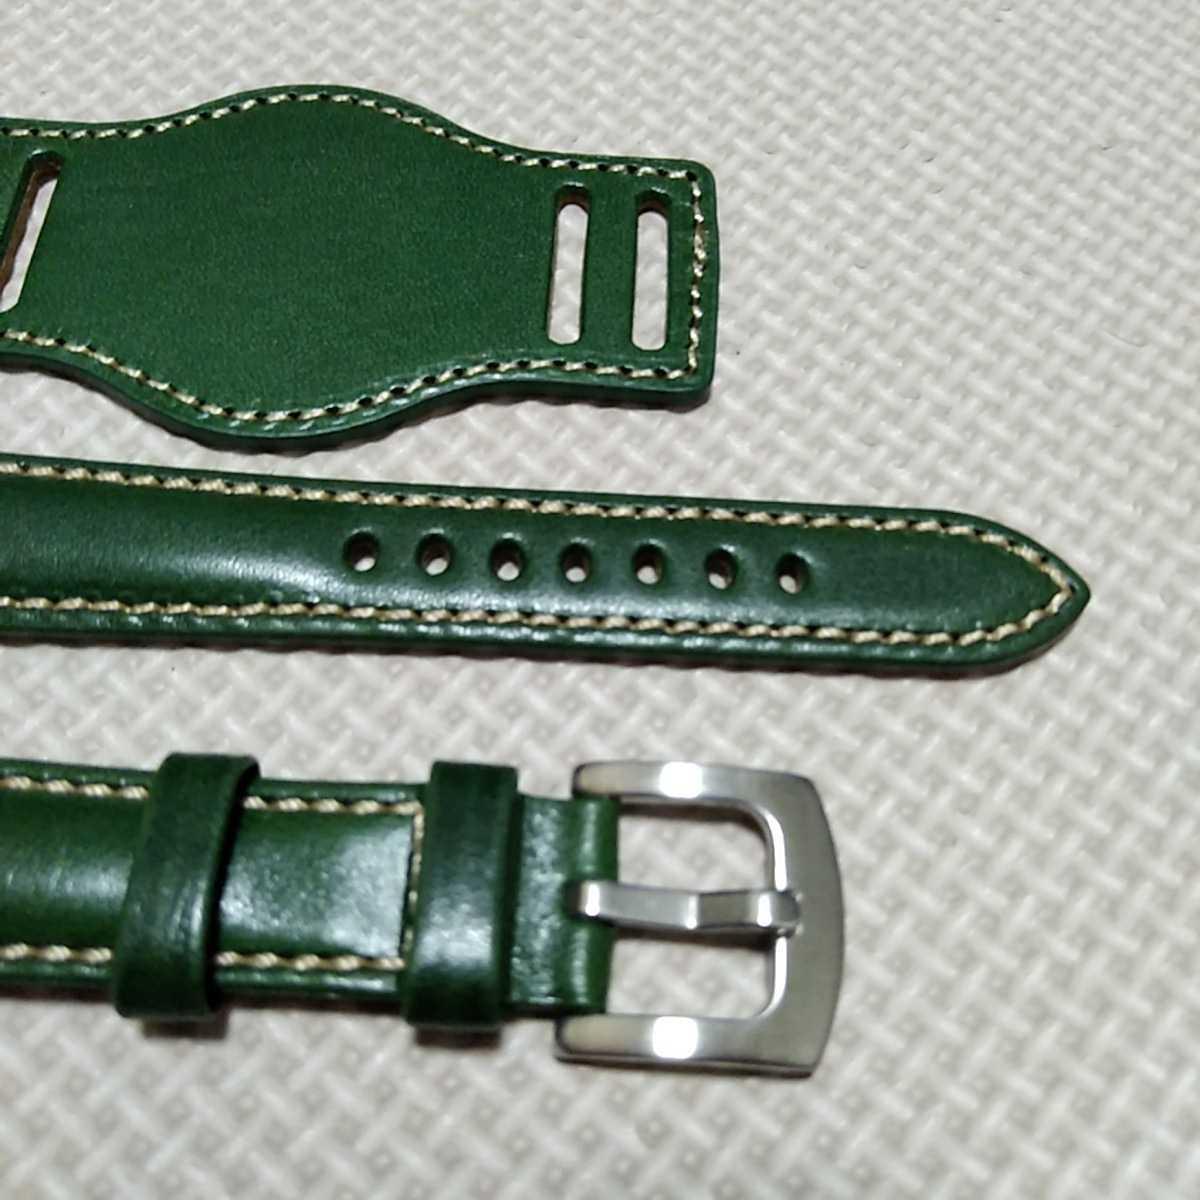 No52 ブンド BUND 本革レザーベルト 腕時計ベルト 交換用ストラップ グリーン 18mm 未使用 高品質 ドイツパイロット 空軍_画像3